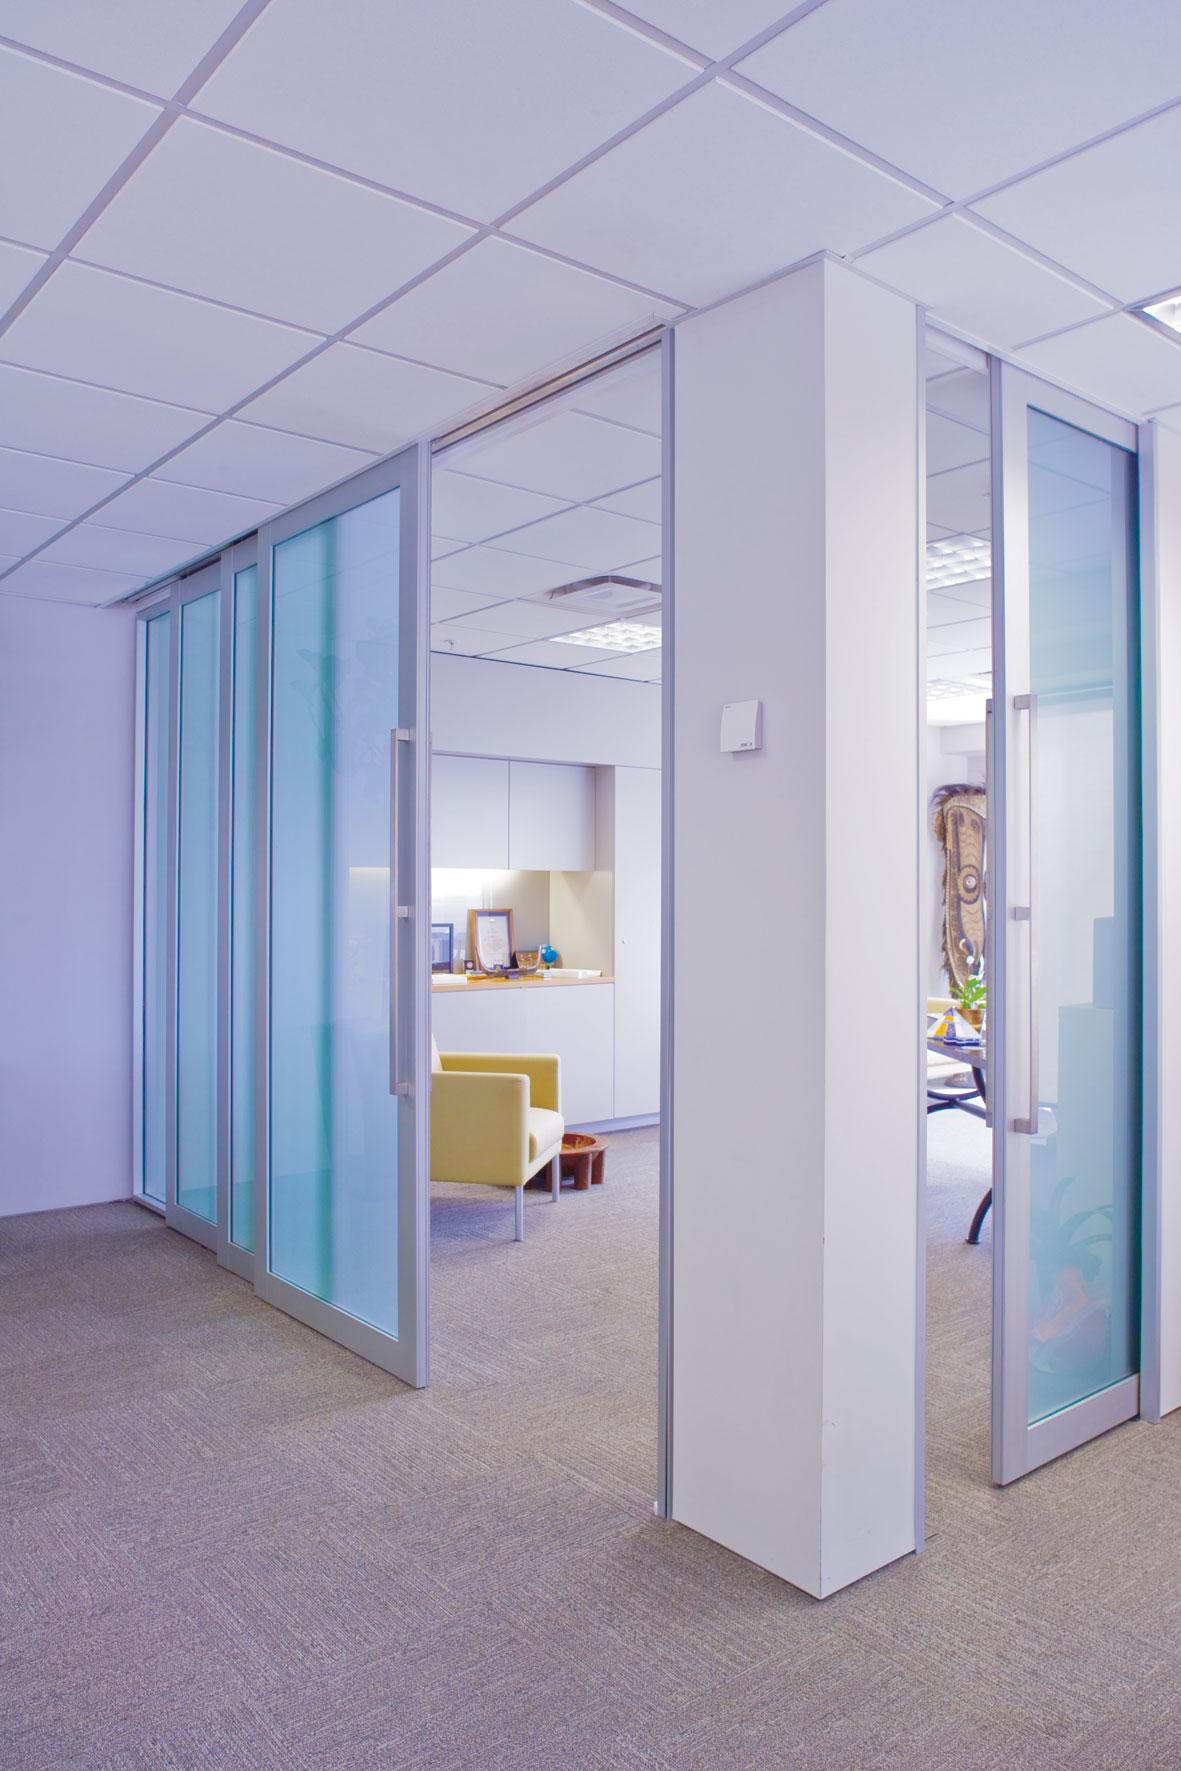 Commercial Sliding Door Tracks Gallery Cavity Sliders Usa